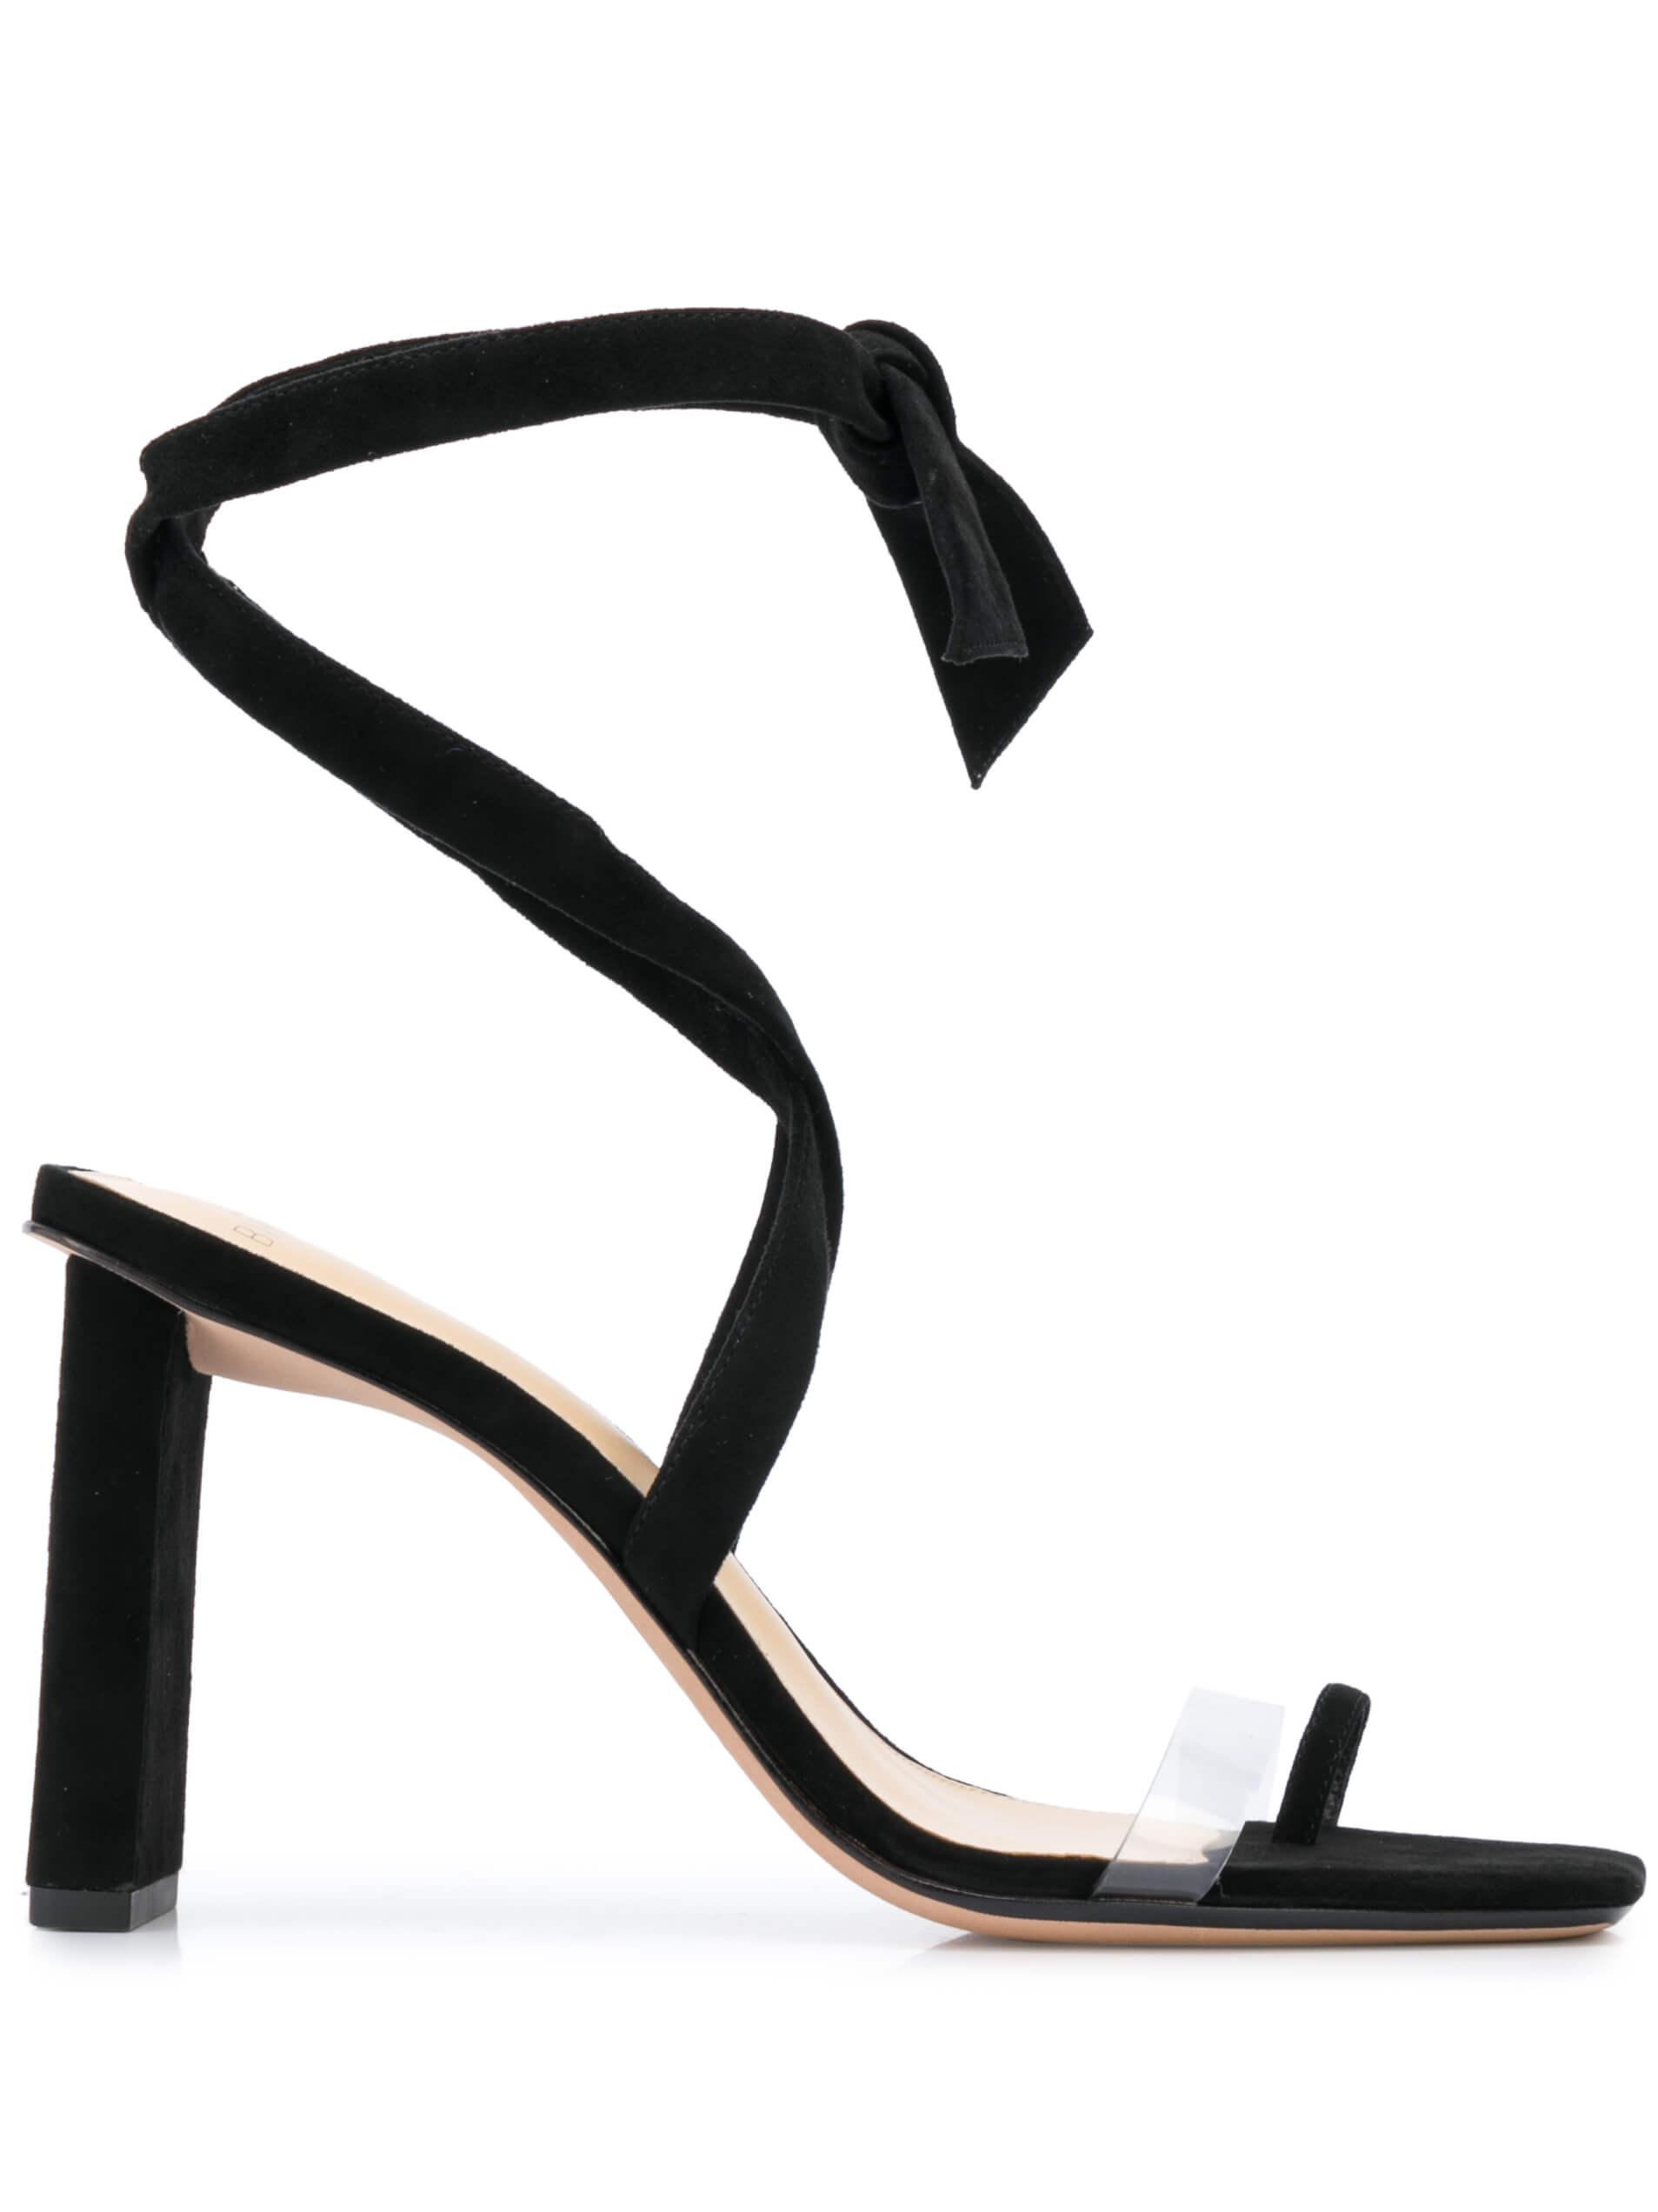 Katie 85mm Pvc/Leather Sandal Item # B3530200010001